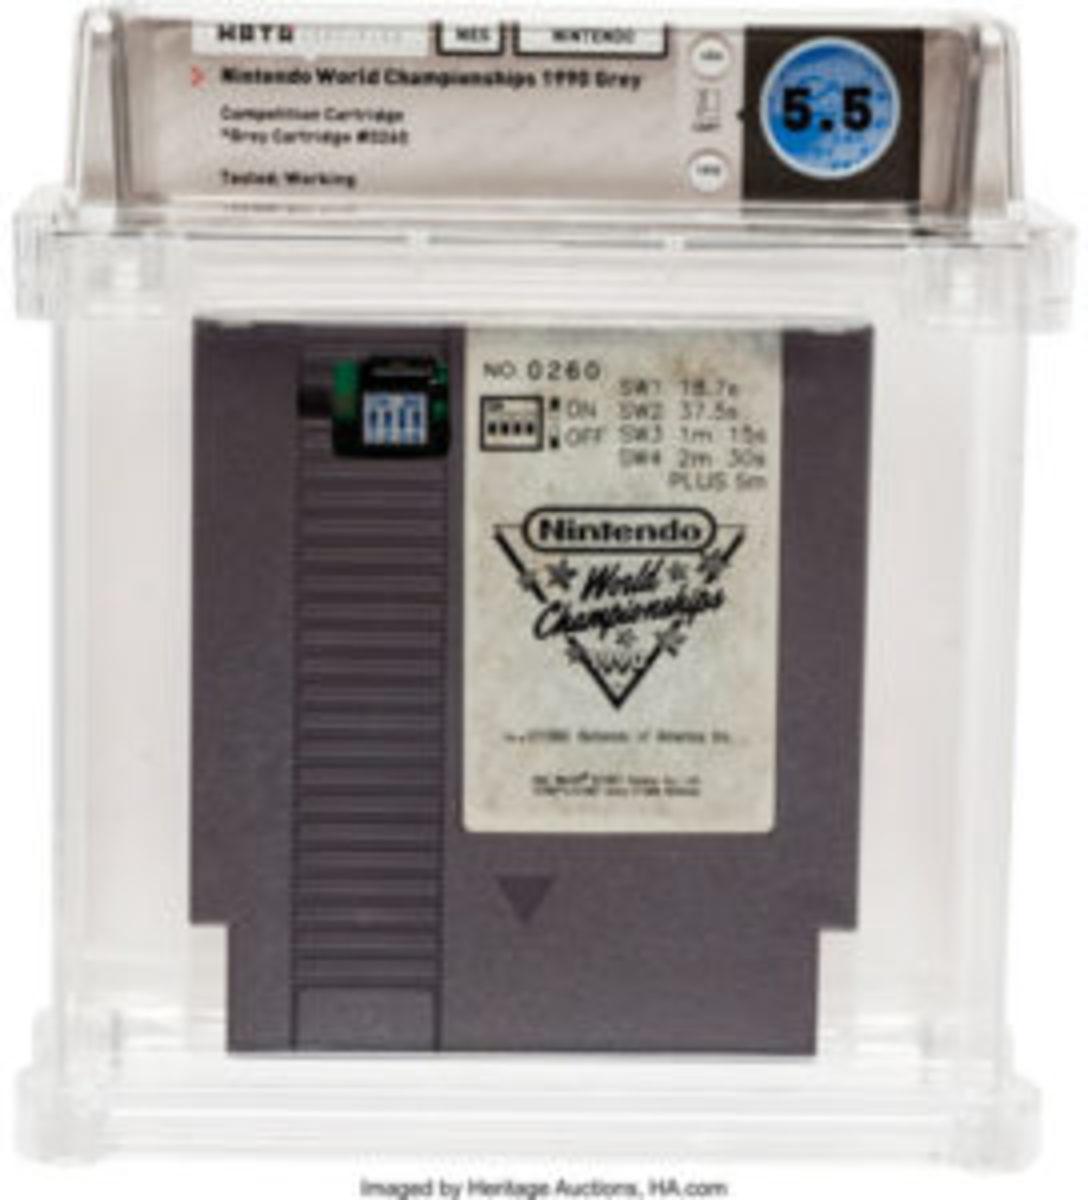 Nintendo World Championships 1990 Gray (NES, Nintendo, 1990) Wata 5.5 (Loose) Cartridge #260.